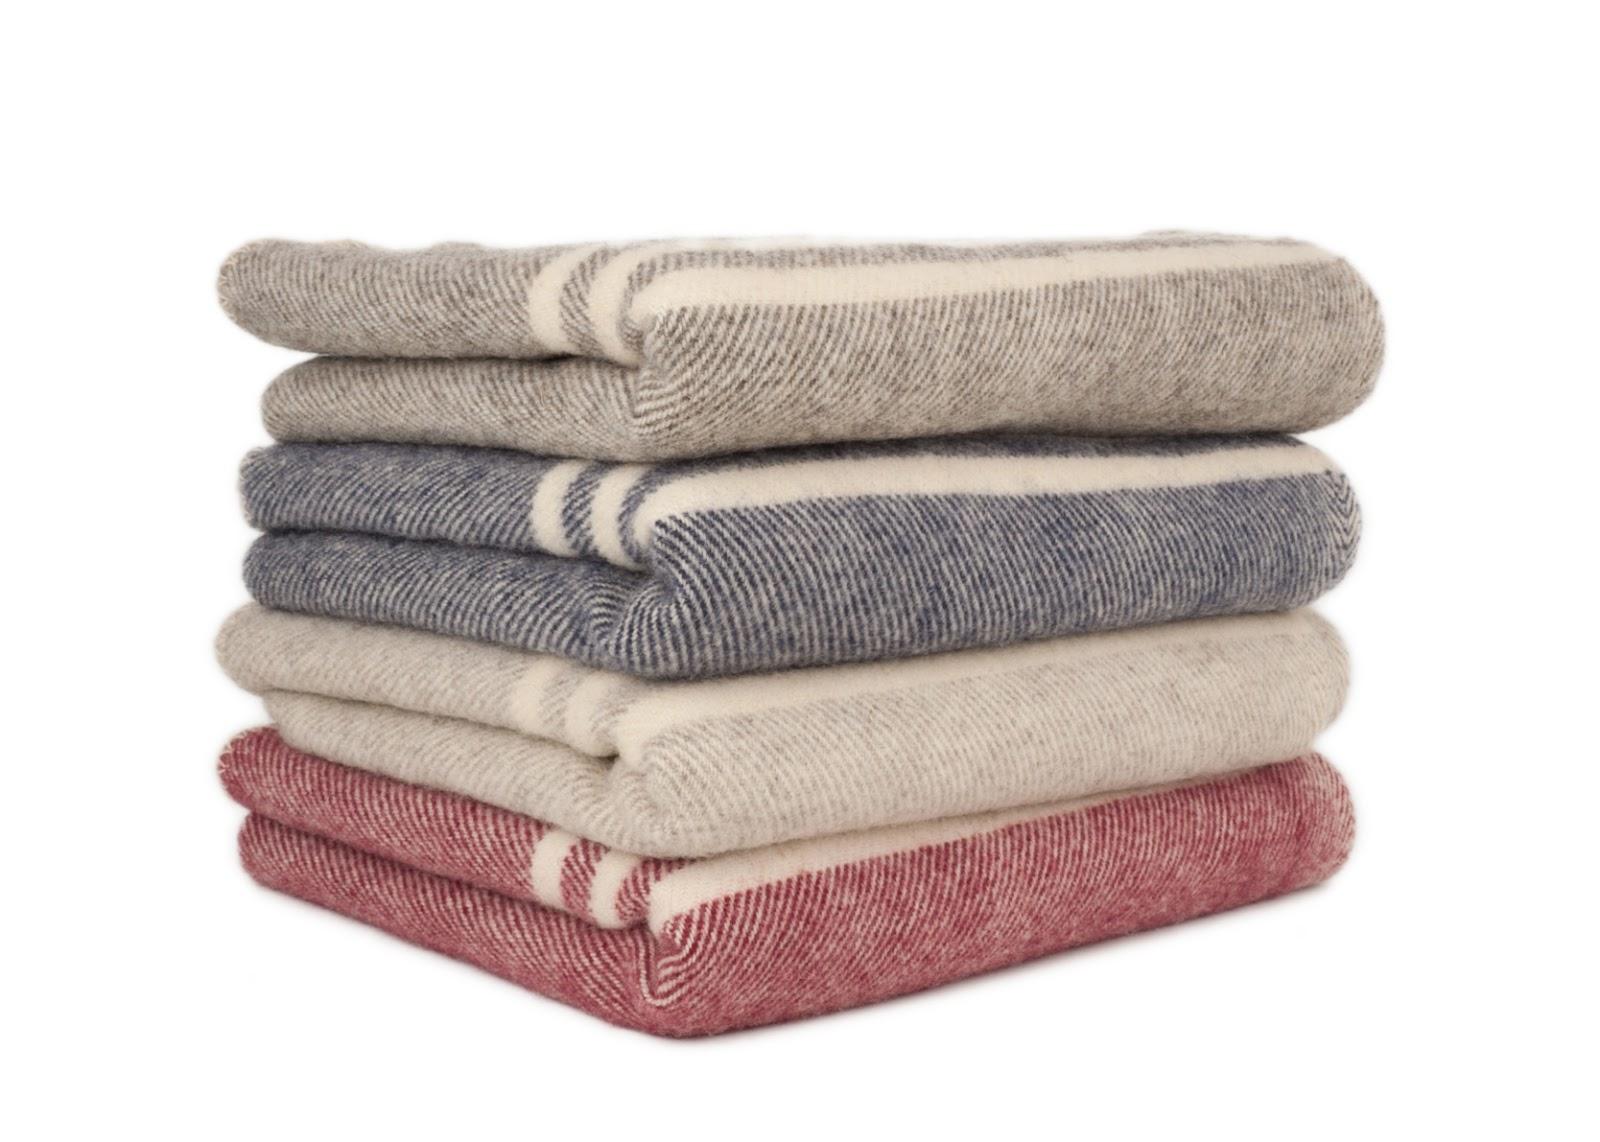 Blanket clipart stacks. Archival restock macausland s